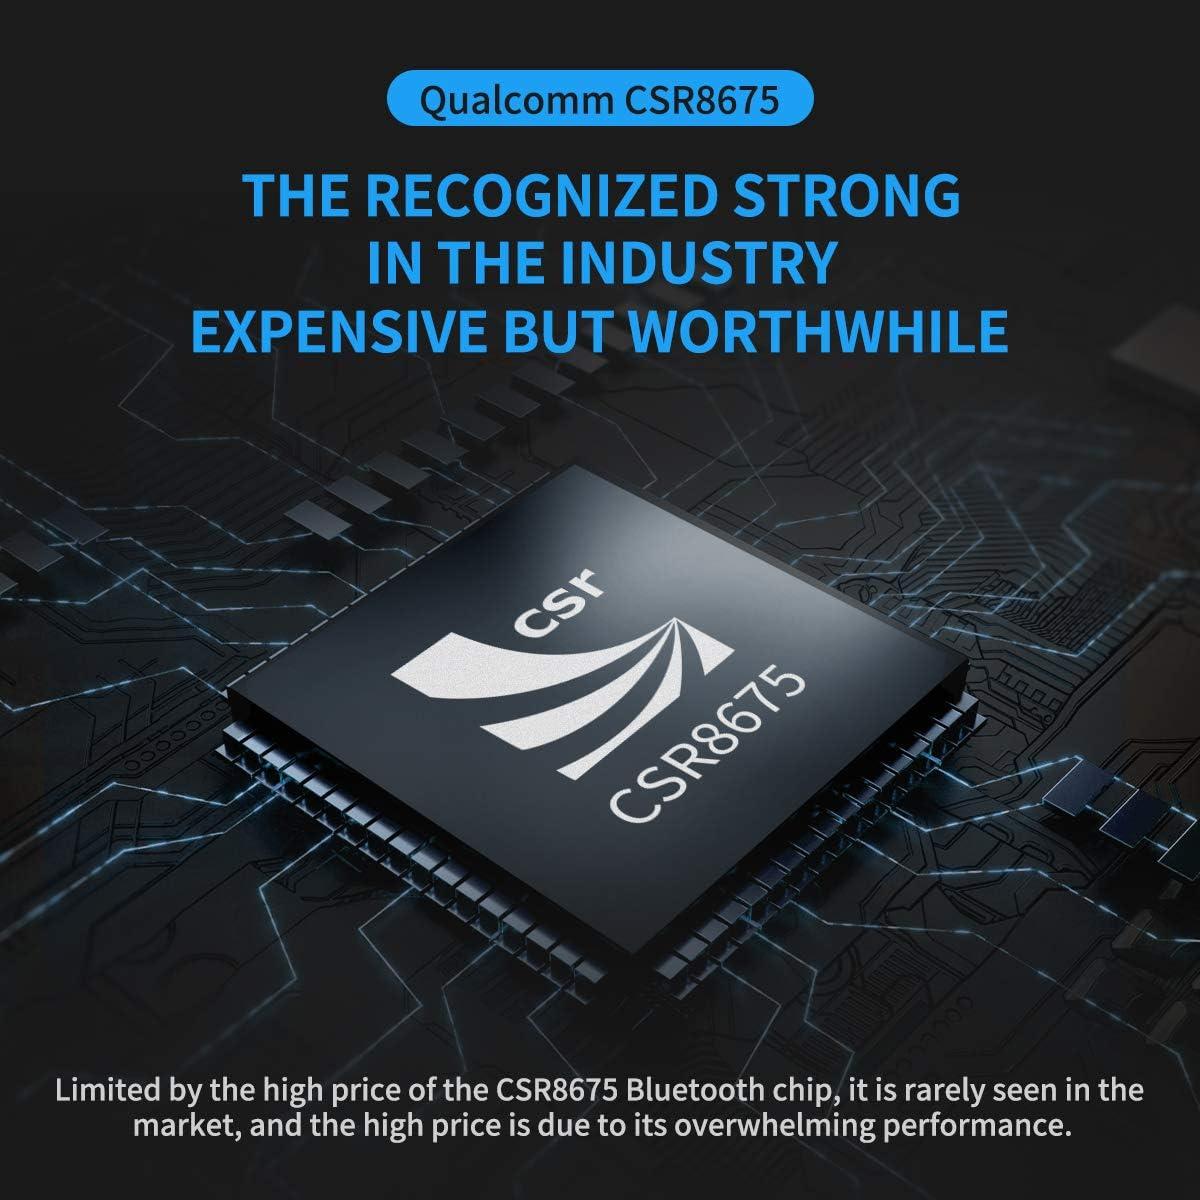 Kz Aptx Hd Csr8675 Bluetooth 5 0 Ipv5 Waterproof Noise Reduction Bluetooth Module Upgrade Cable Mmcx Pin Amazon Ca Electronics